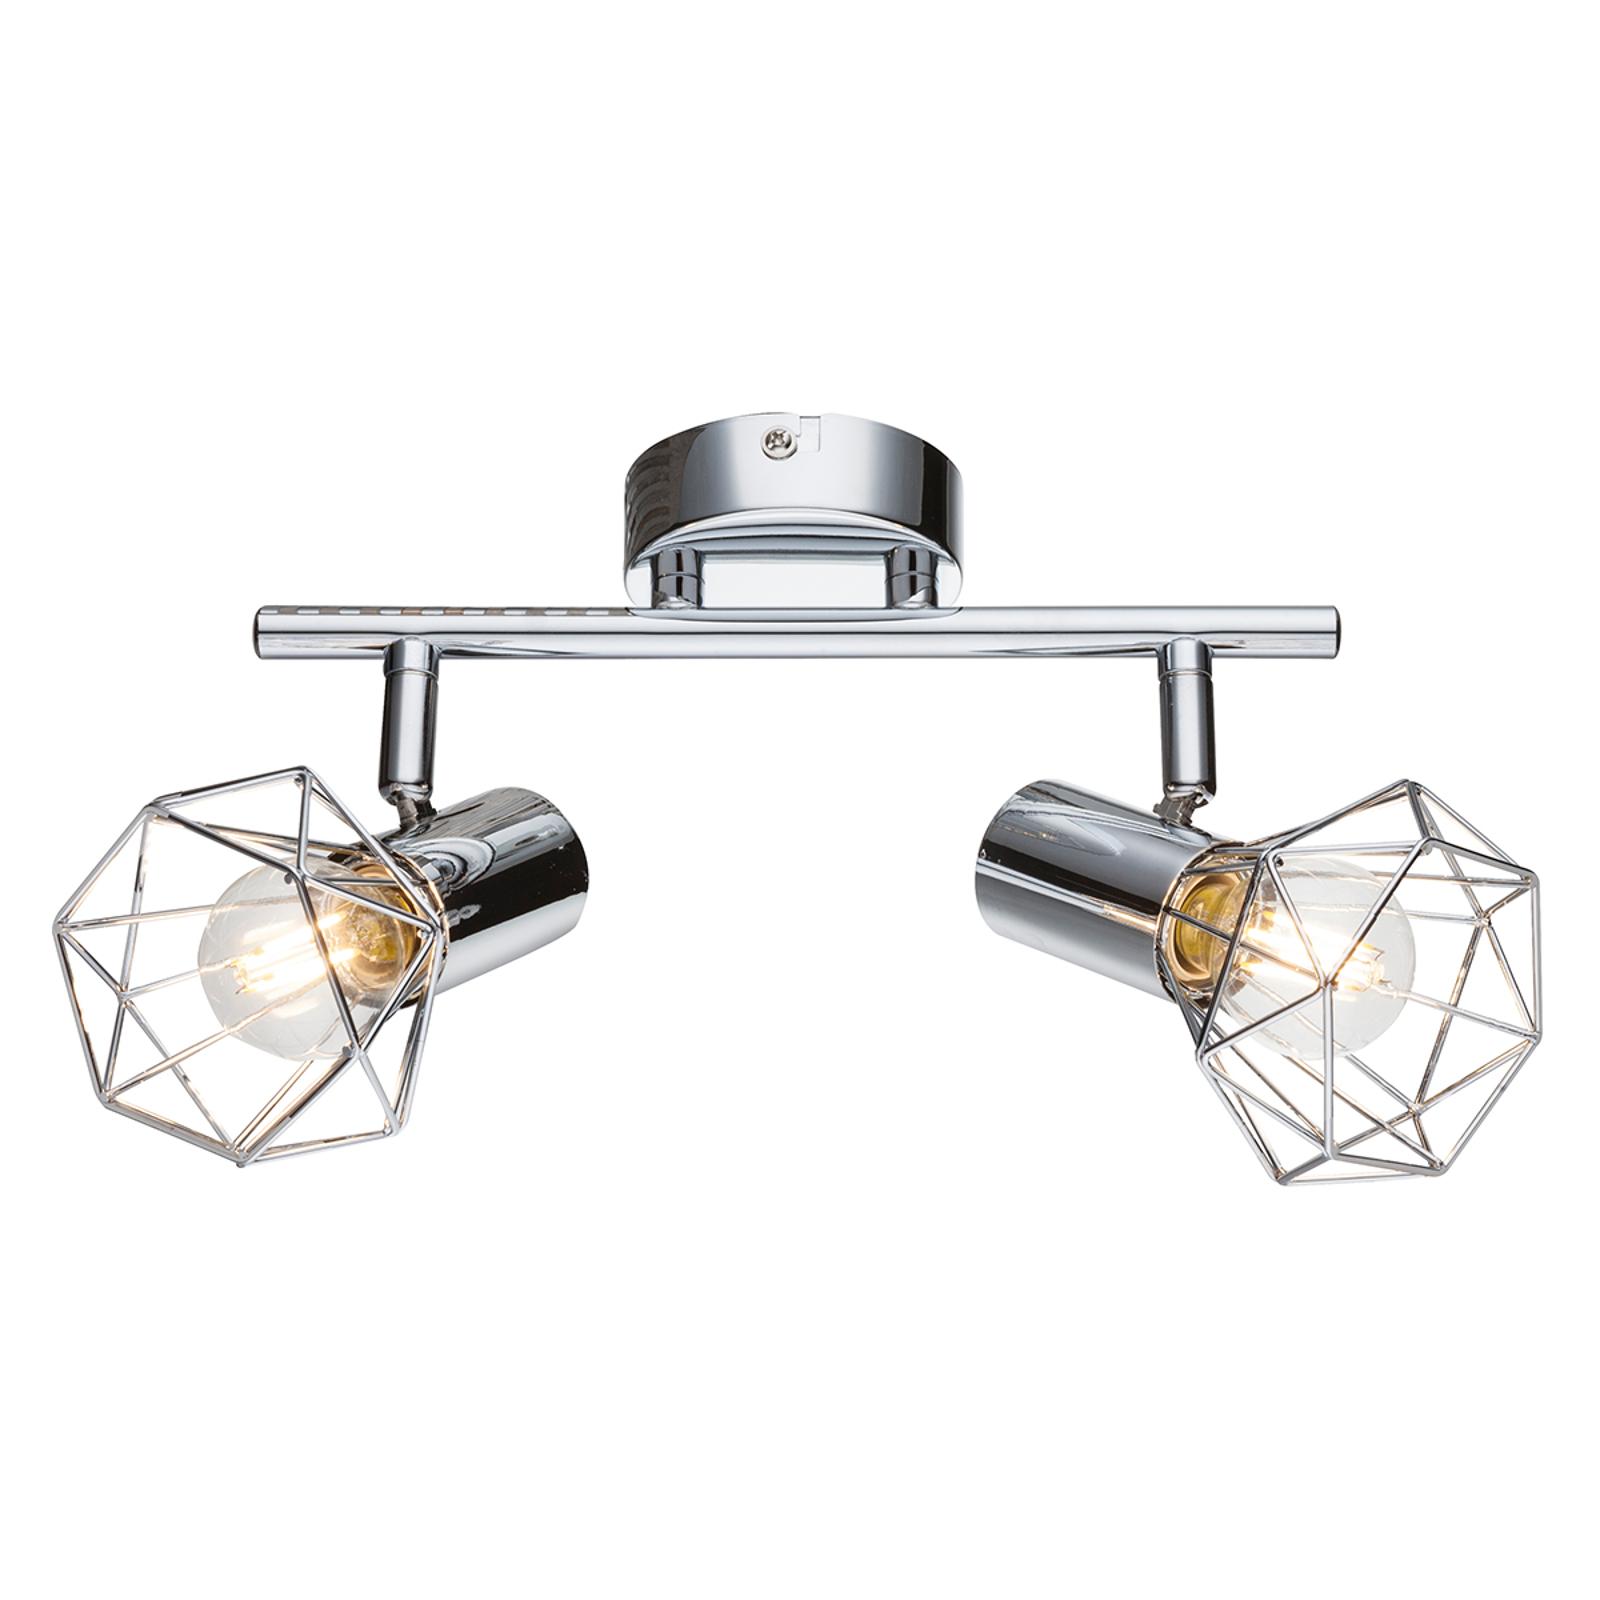 Ultranowoczesna lampa sufitowa Daiva 2-punktowa